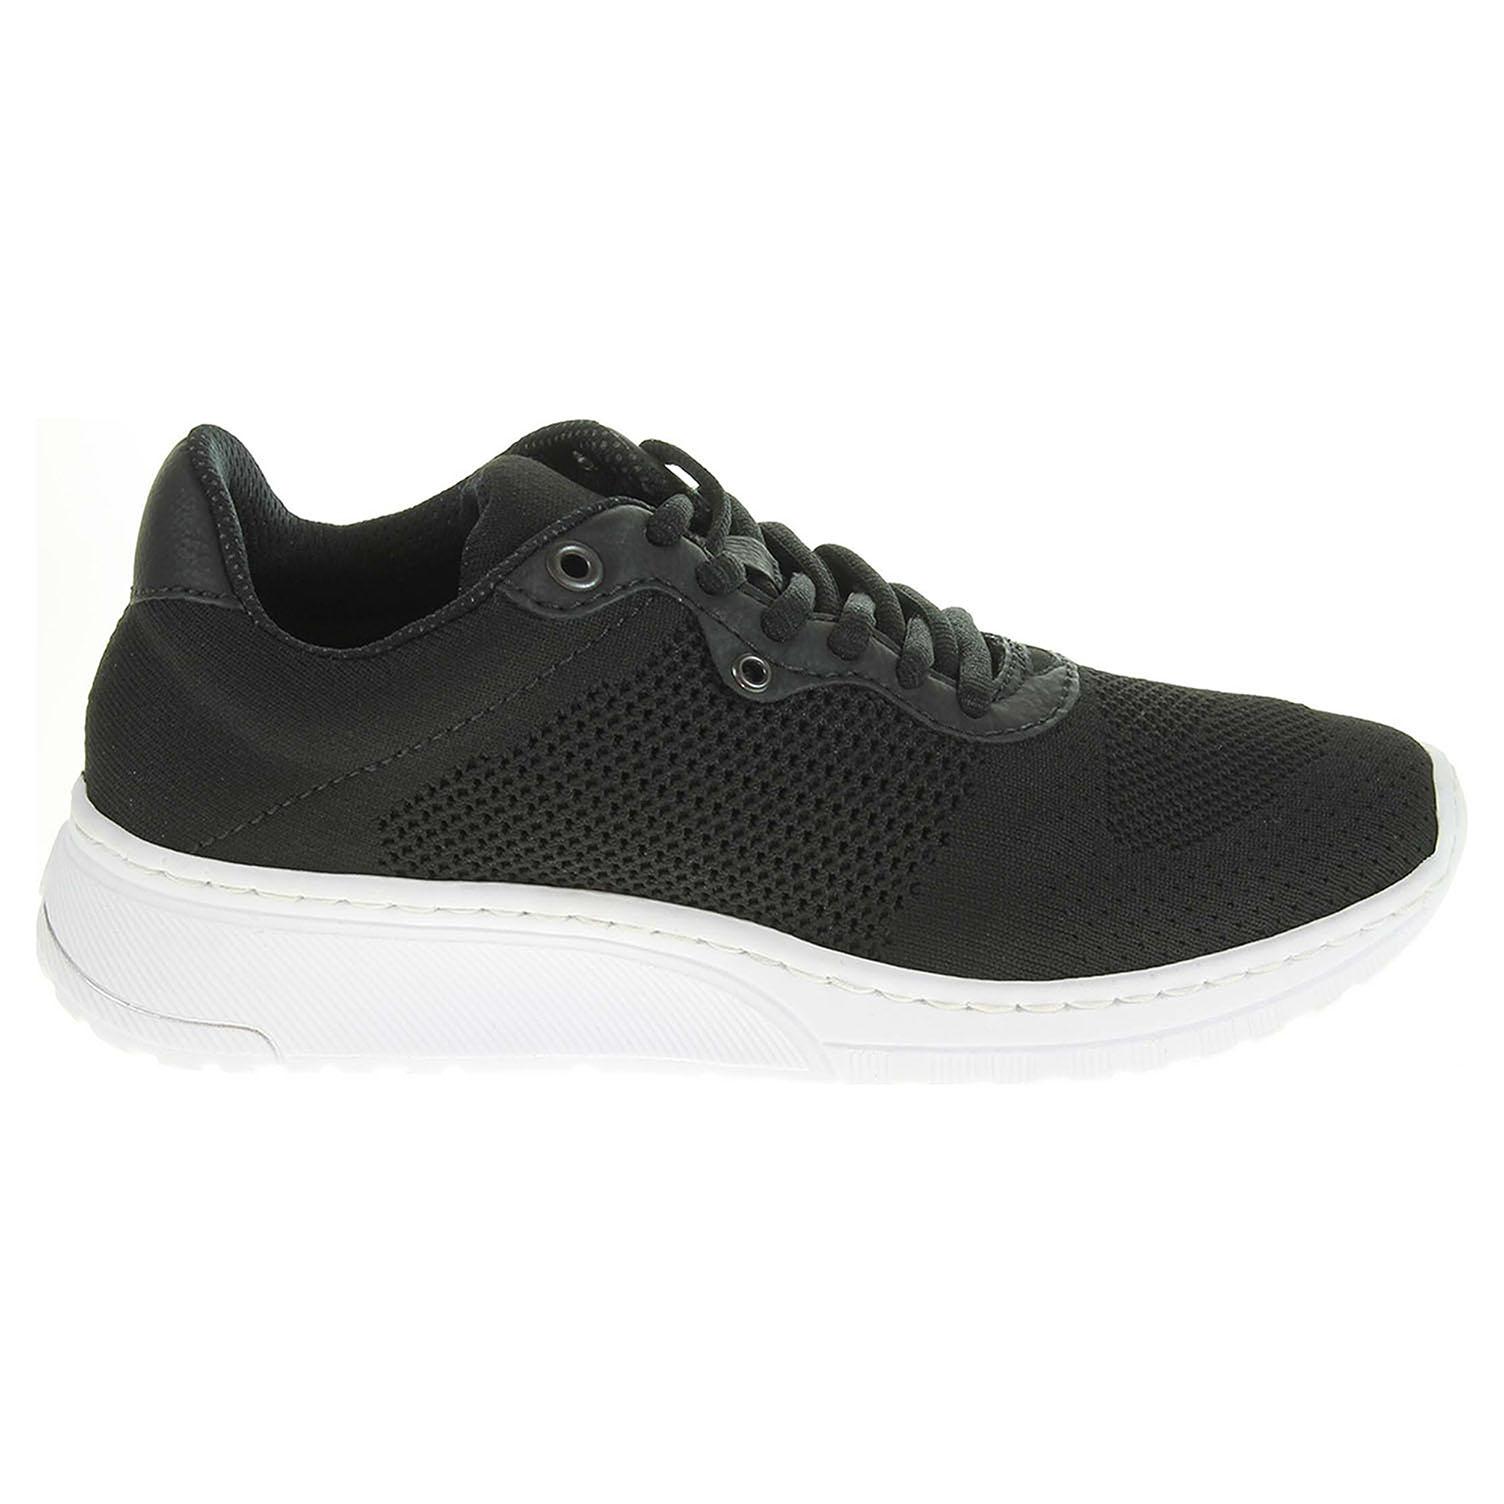 Ecco Rieker dámská obuv N5006-00 schwarz 23200763 933c76a7654